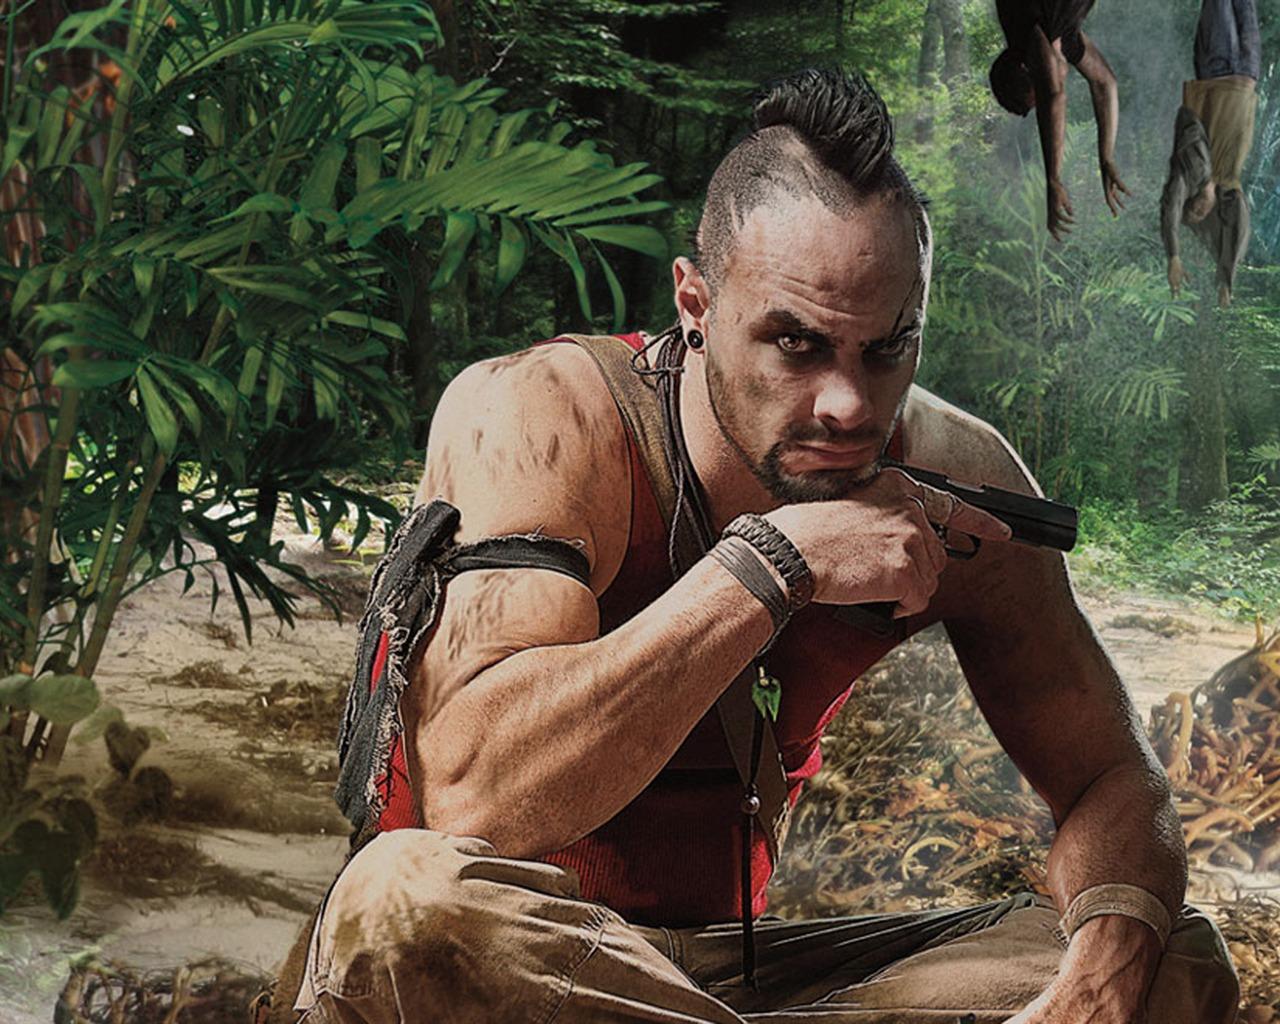 2012 Far Cry 3 Game Hd Wallpaper 27 Preview 10wallpaper Com